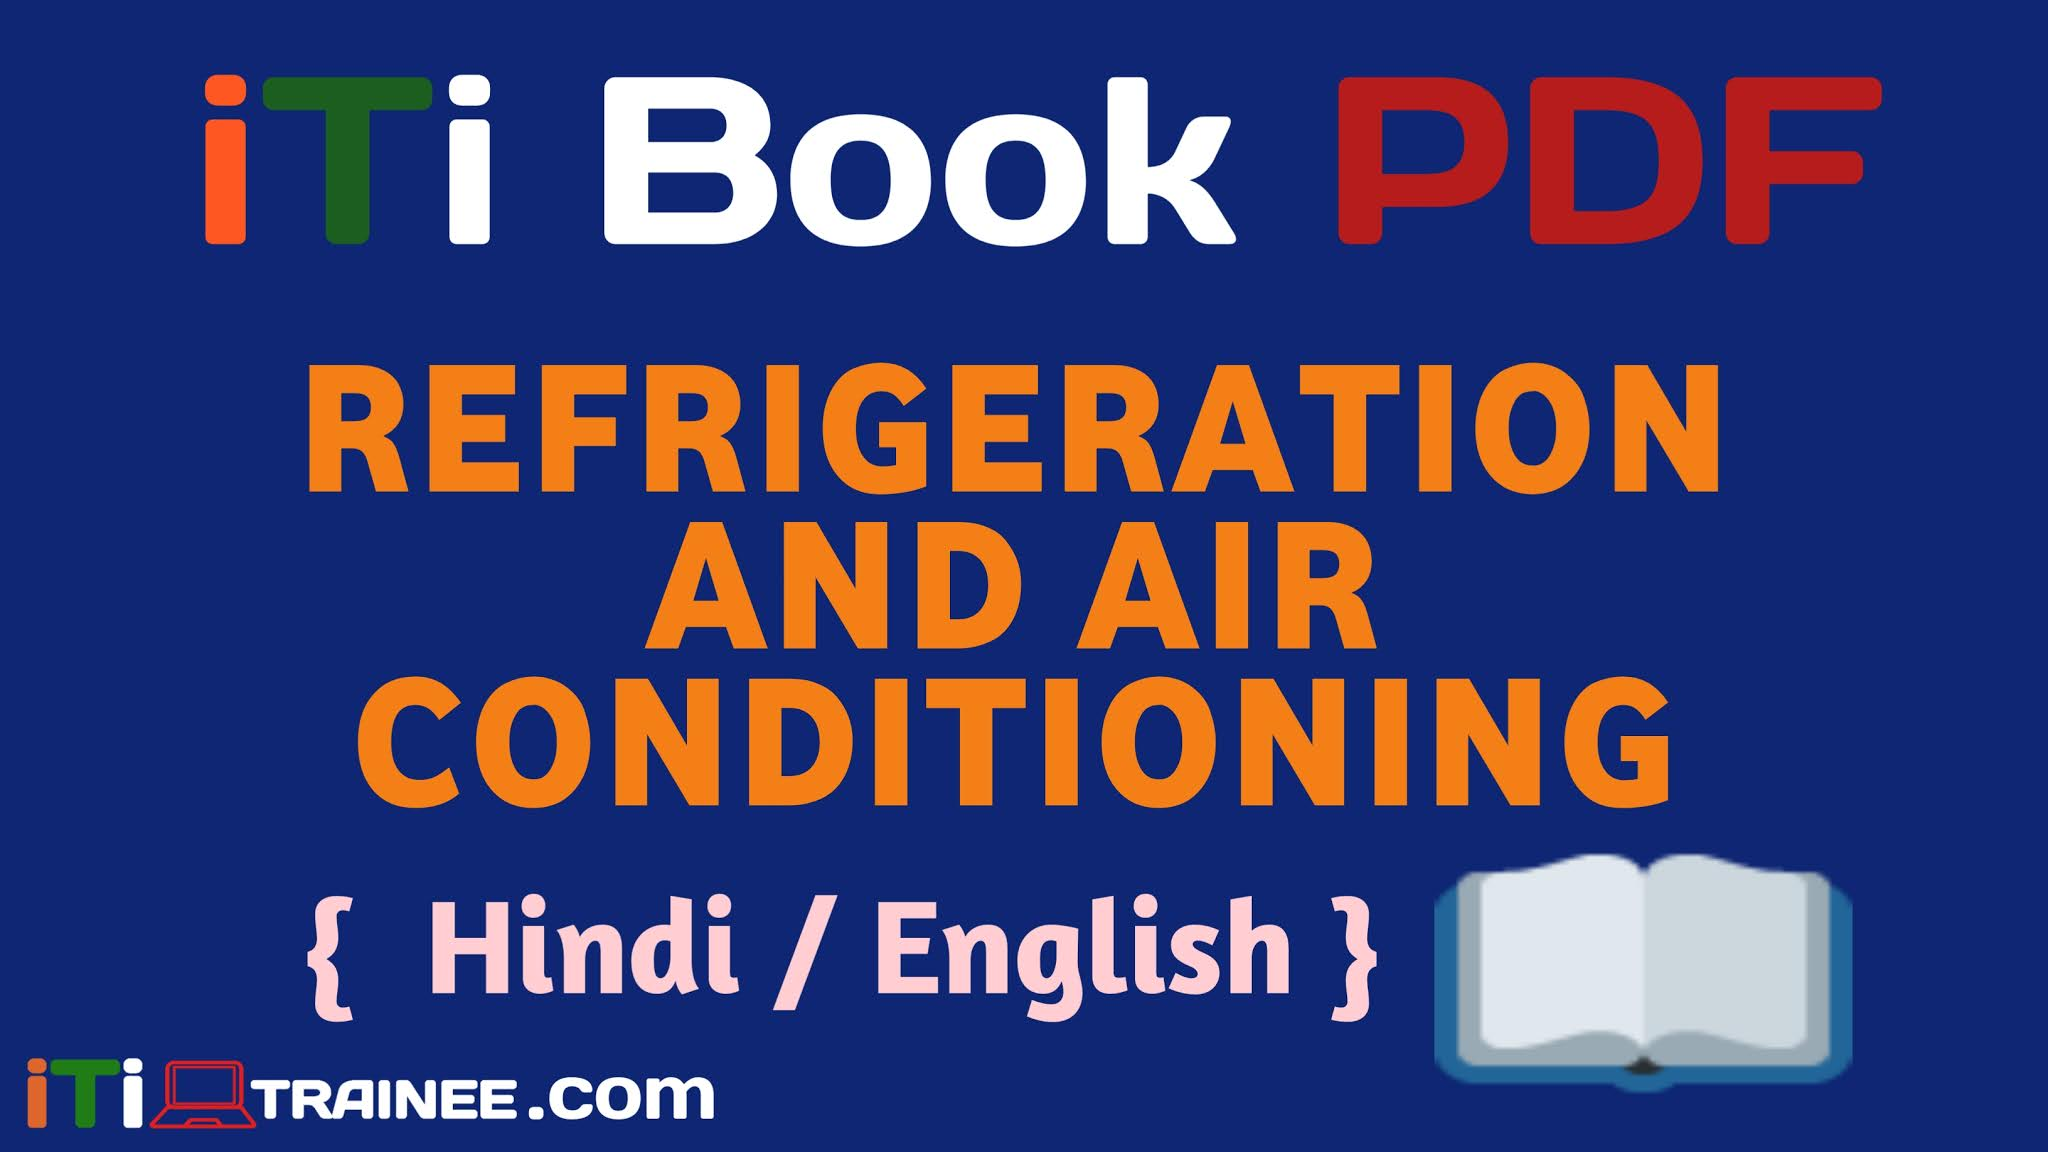 ITI MRAC BOOK PDF Download